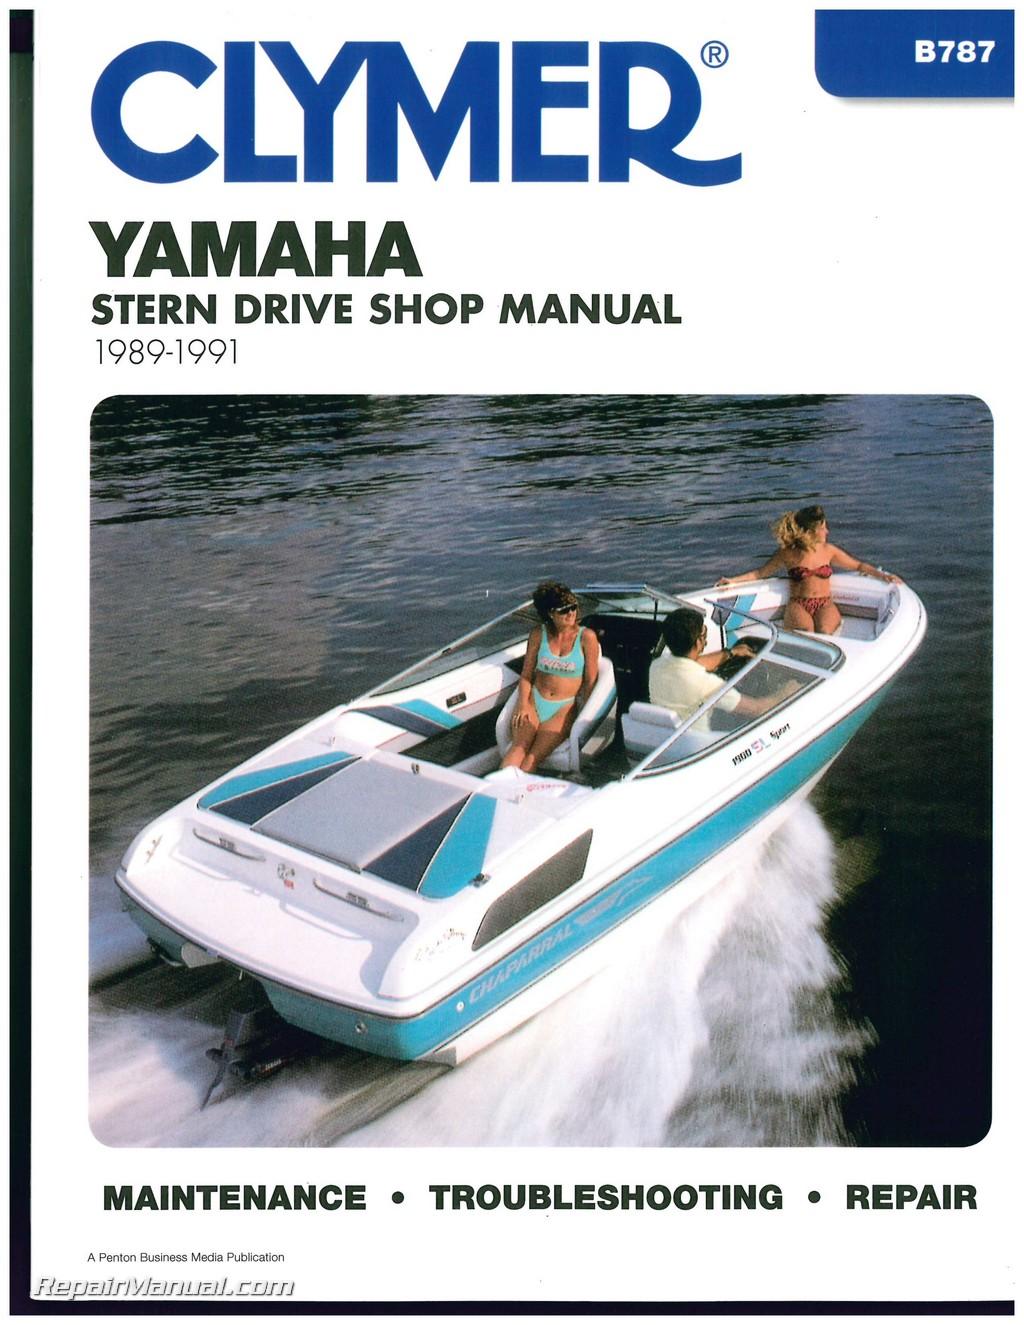 1989 hurricane open motor owners manual